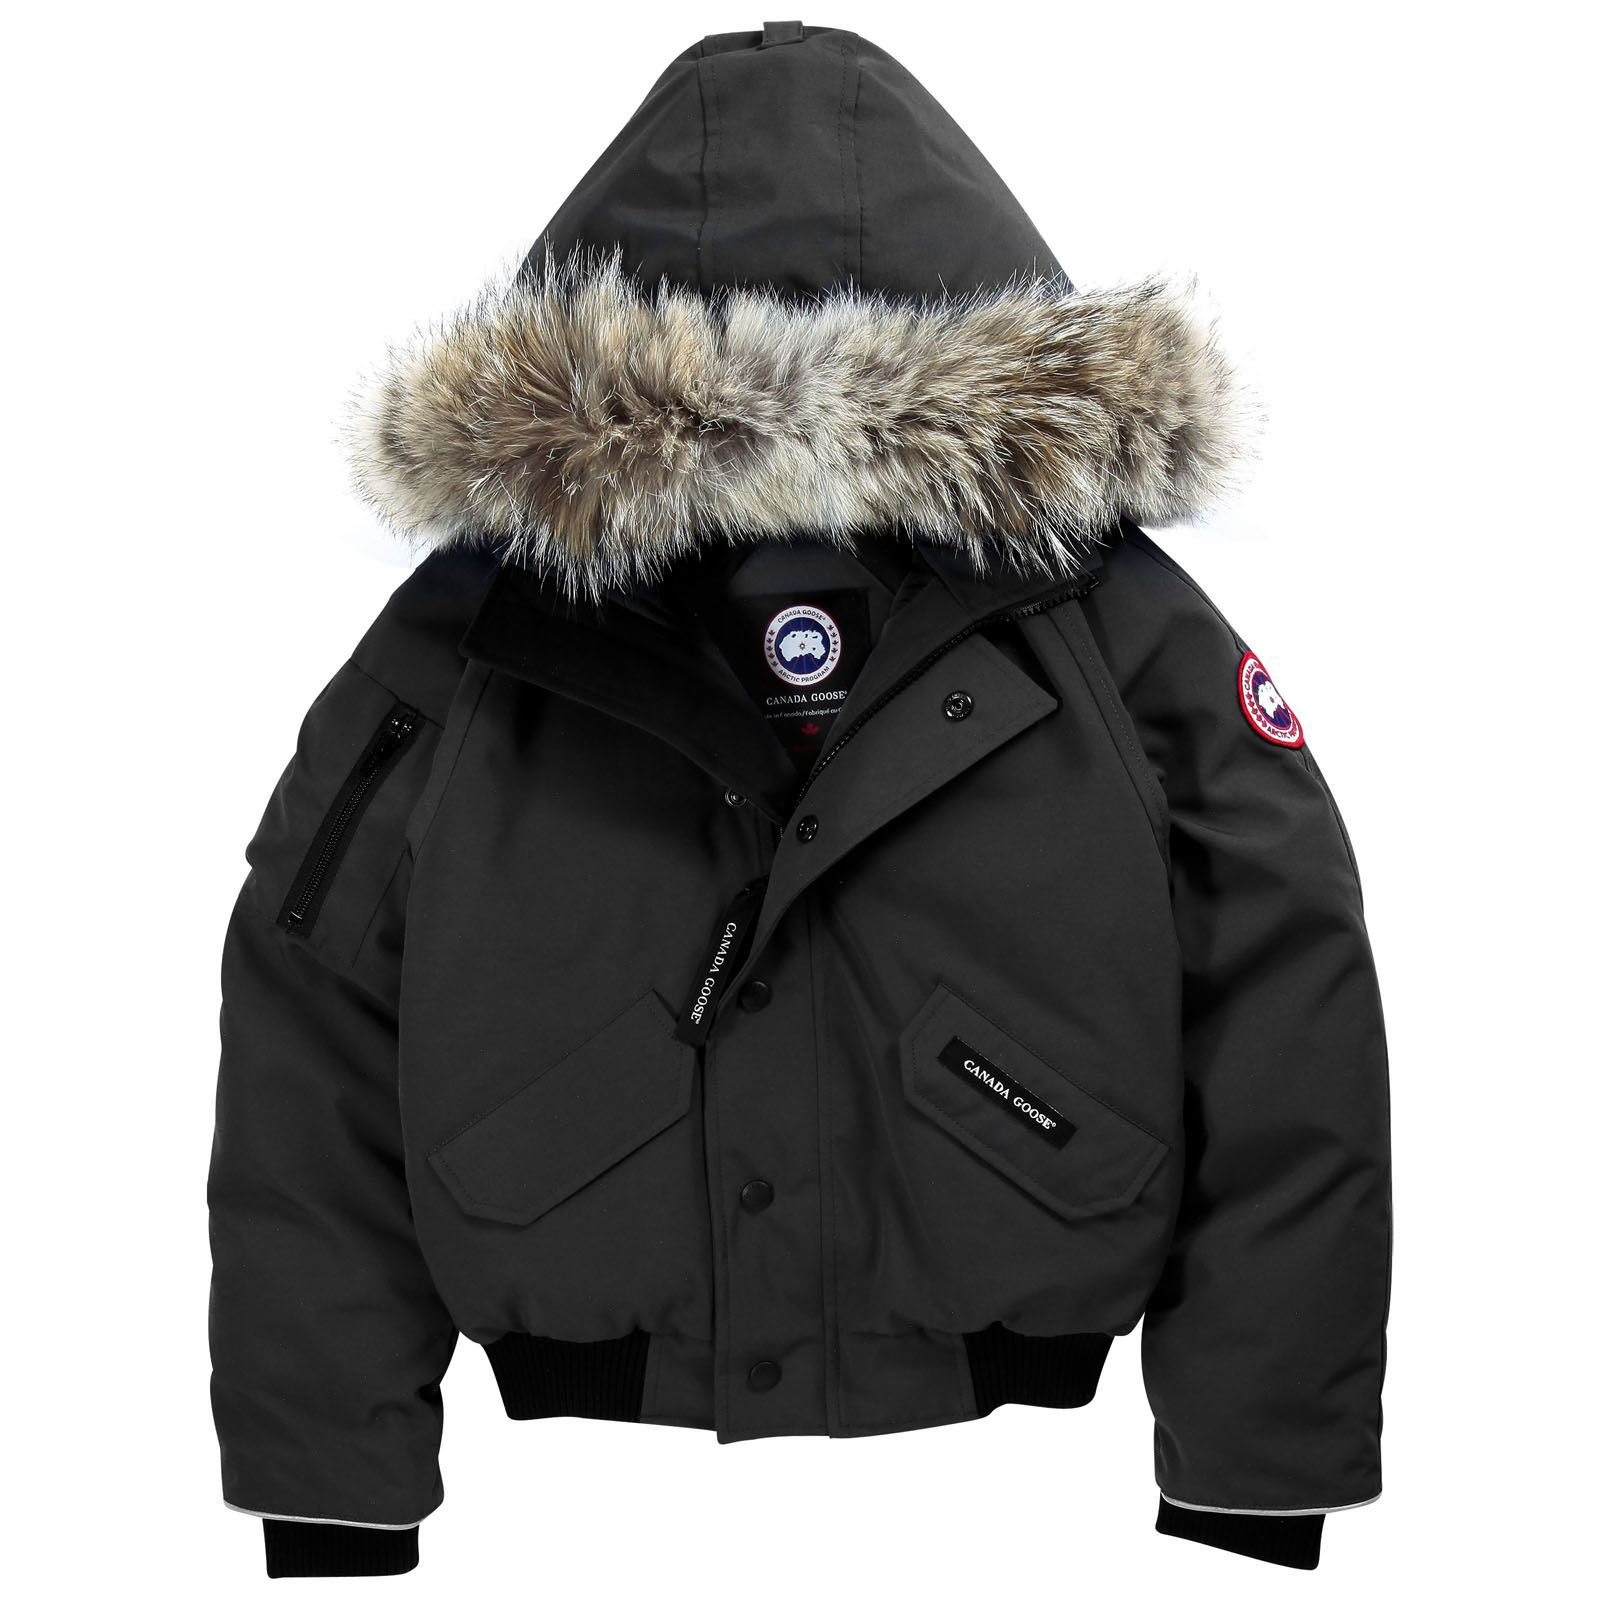 Black goose jacket